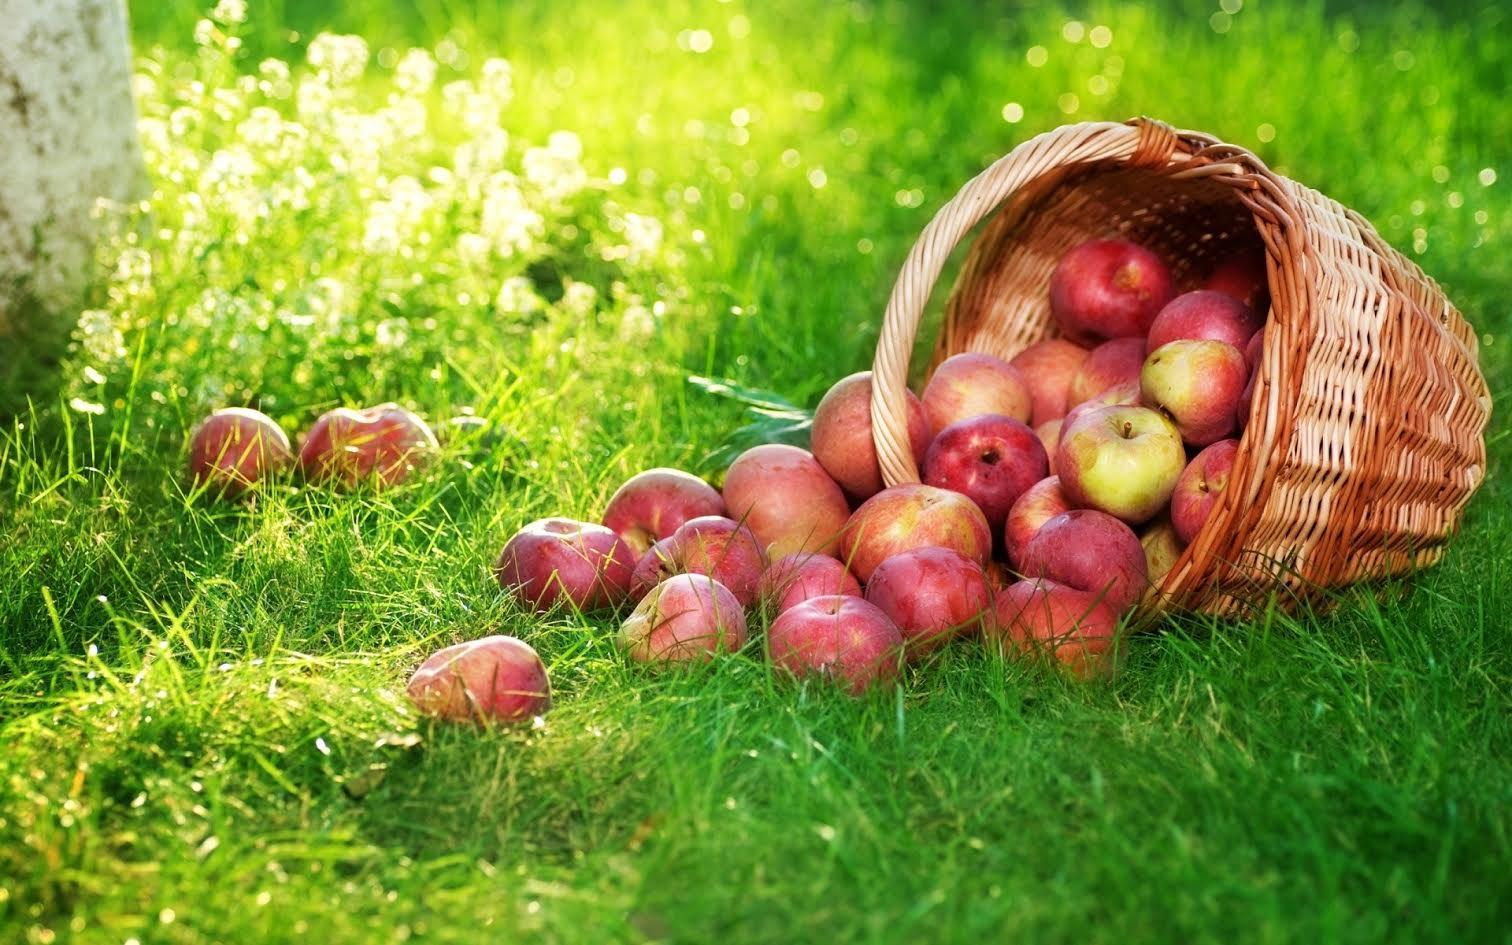 Яблочный Спас 19 августа 2018 года